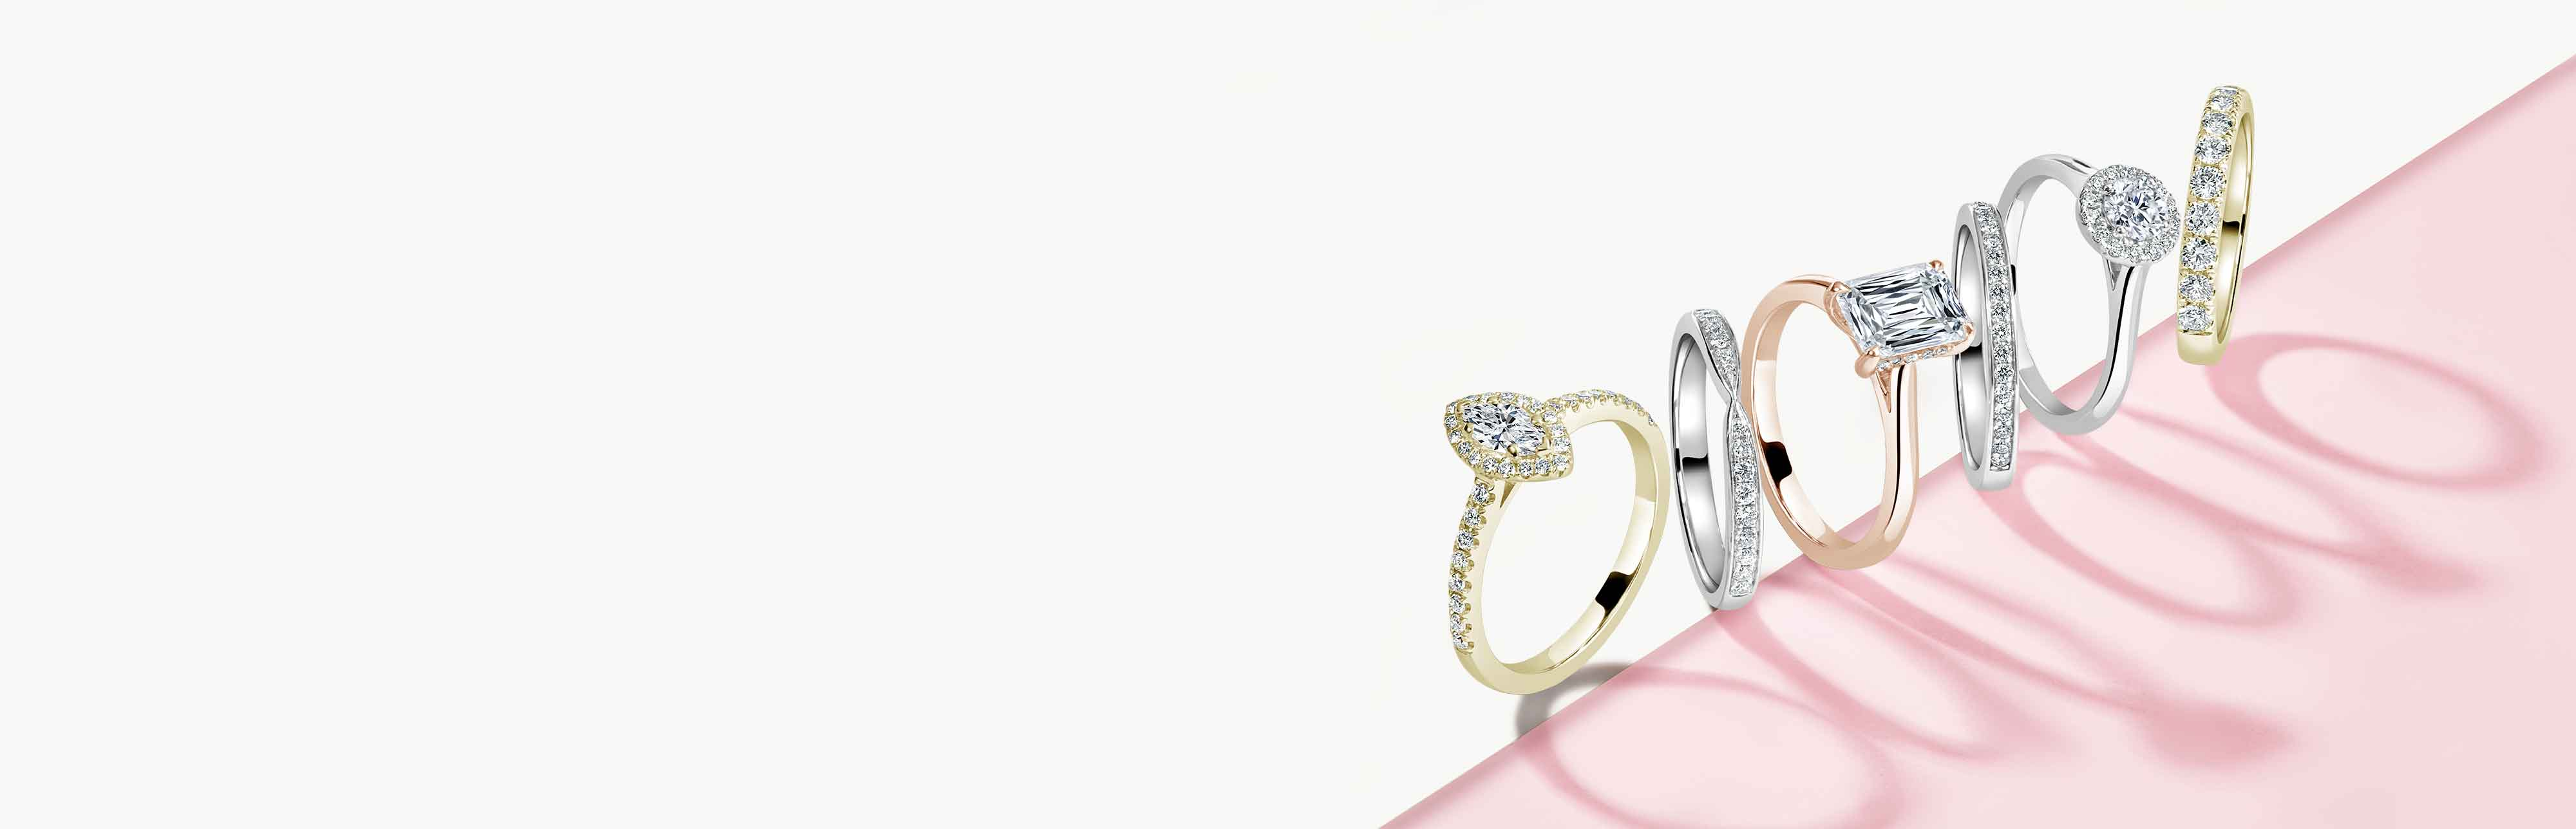 Rose Gold Emerald Cut Engagement Rings - Steven Stone